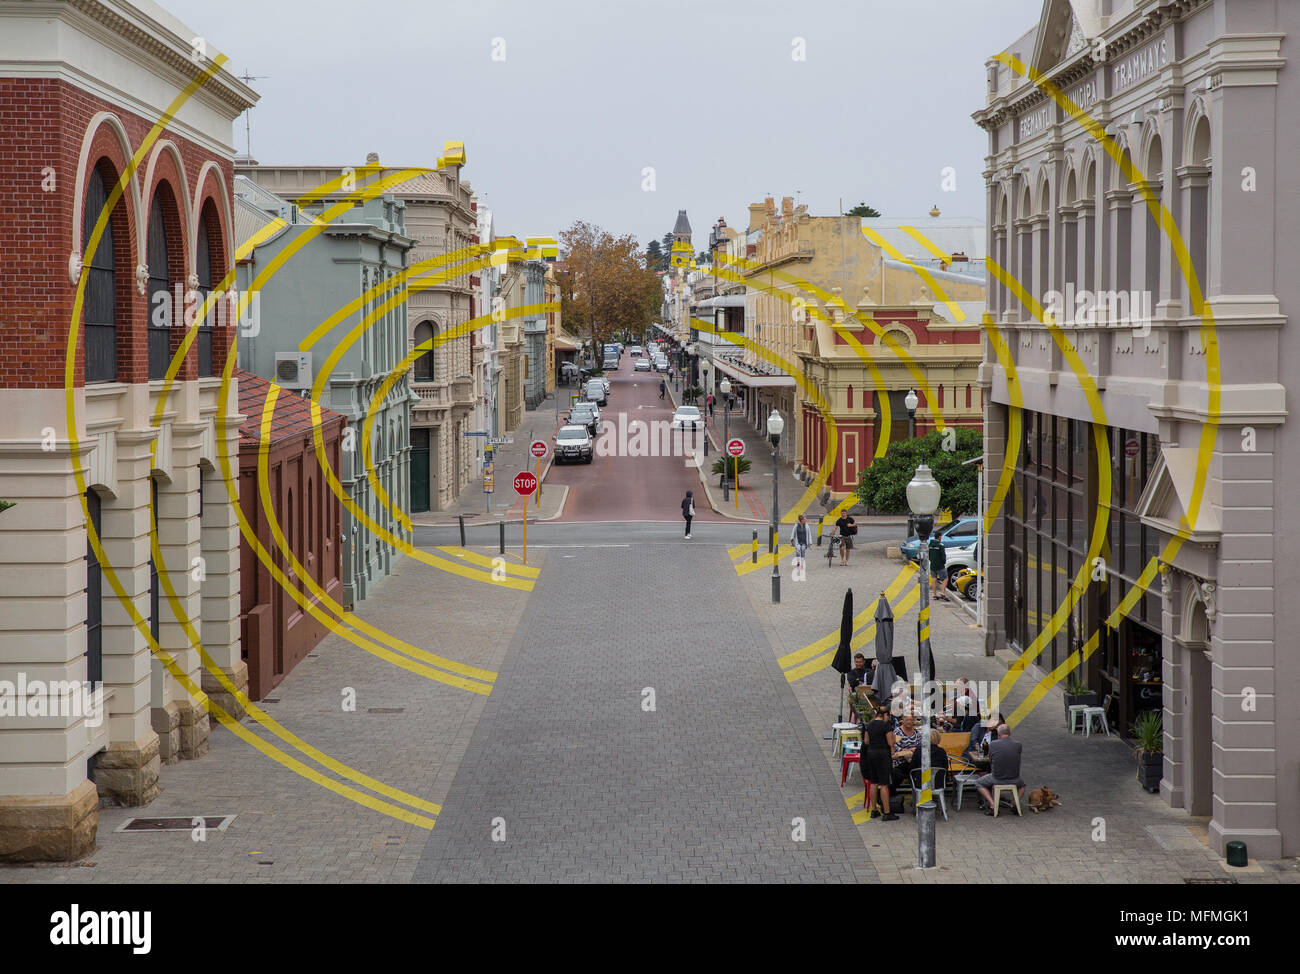 Fremantle ilusión óptica street art - Imagen De Stock